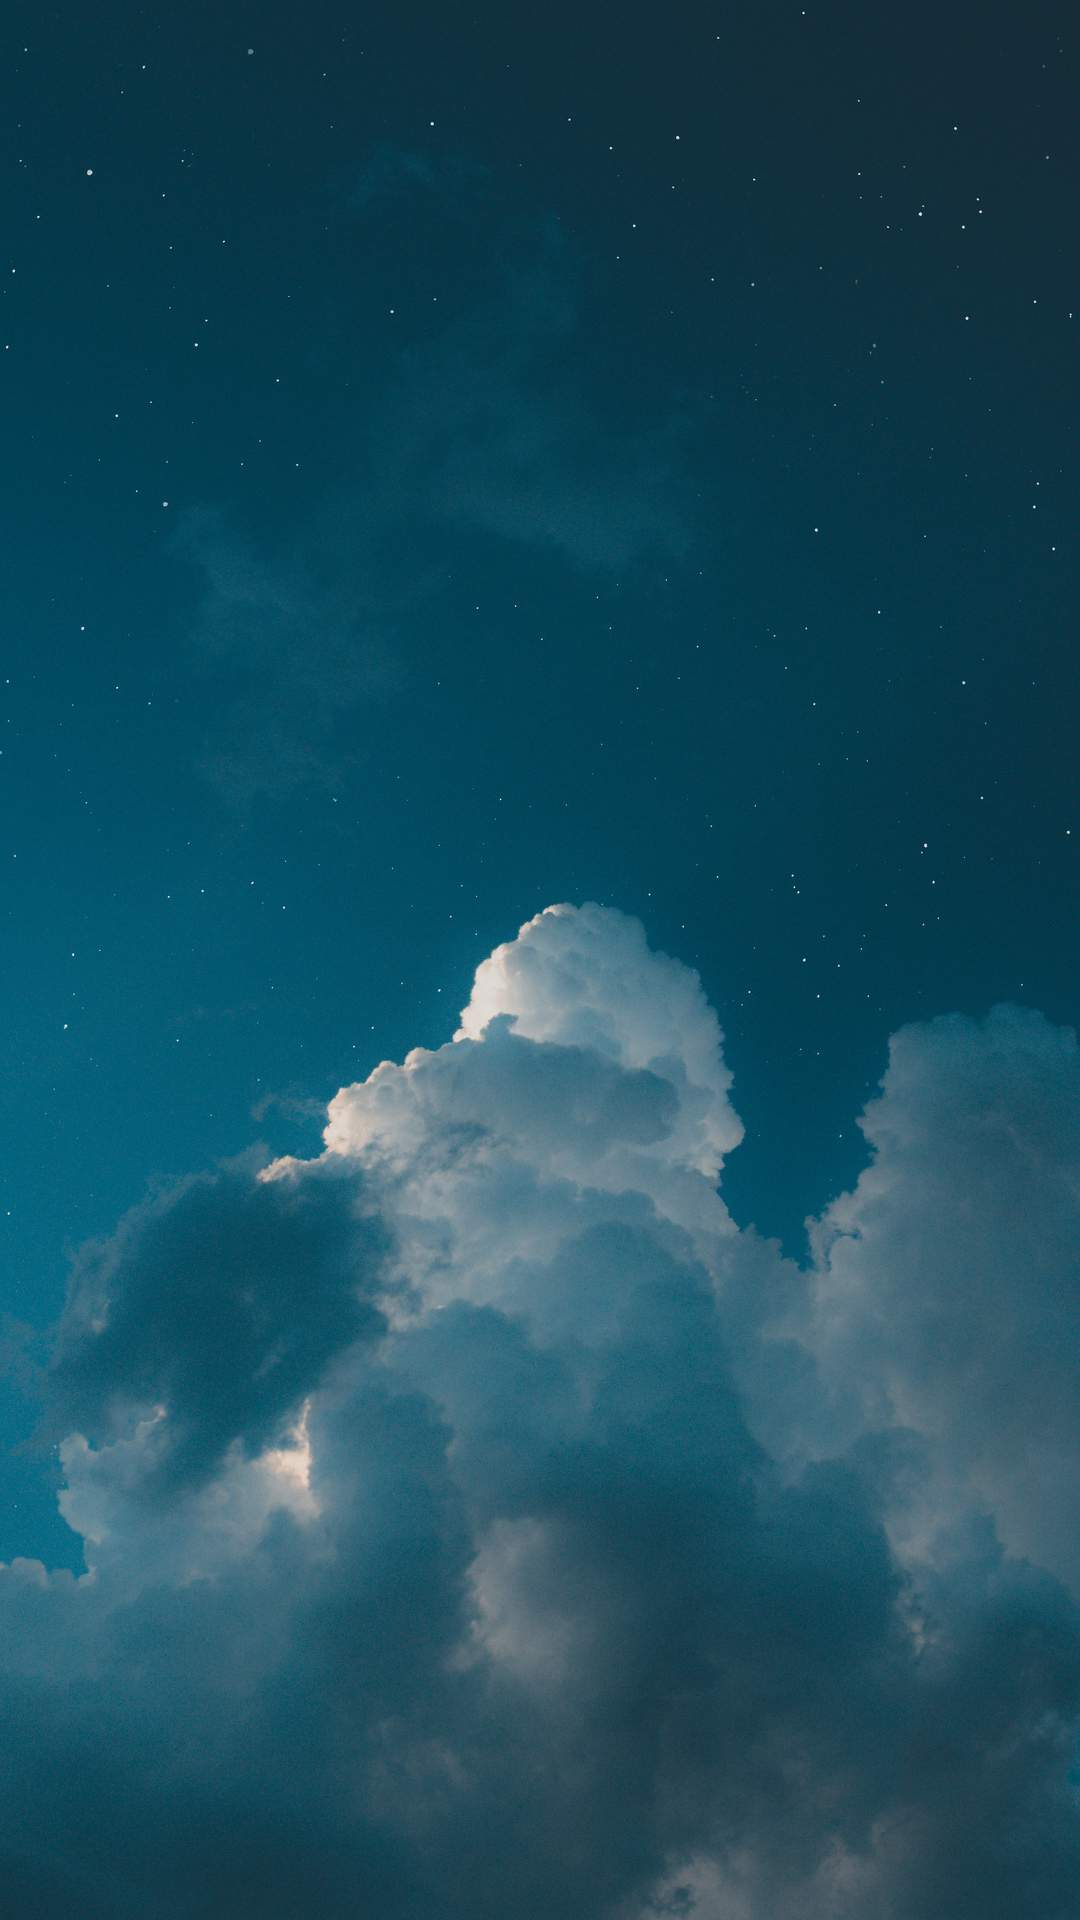 Star Clouds iPhone Wallpaper